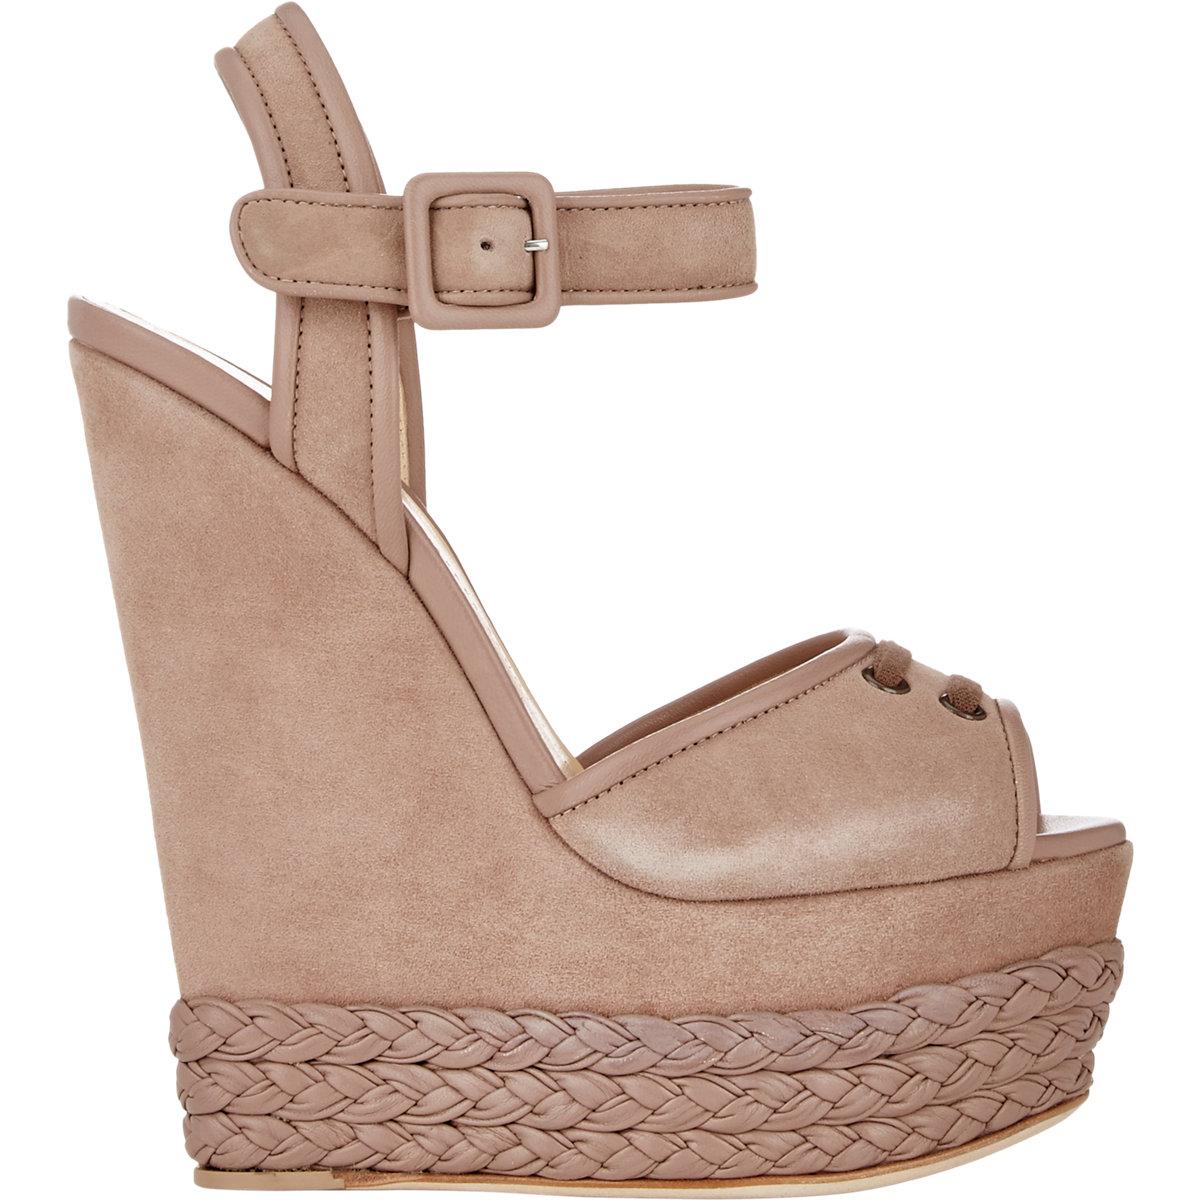 Lyst - Giuseppe Zanotti Braided Platform-wedge Sandals in Brown